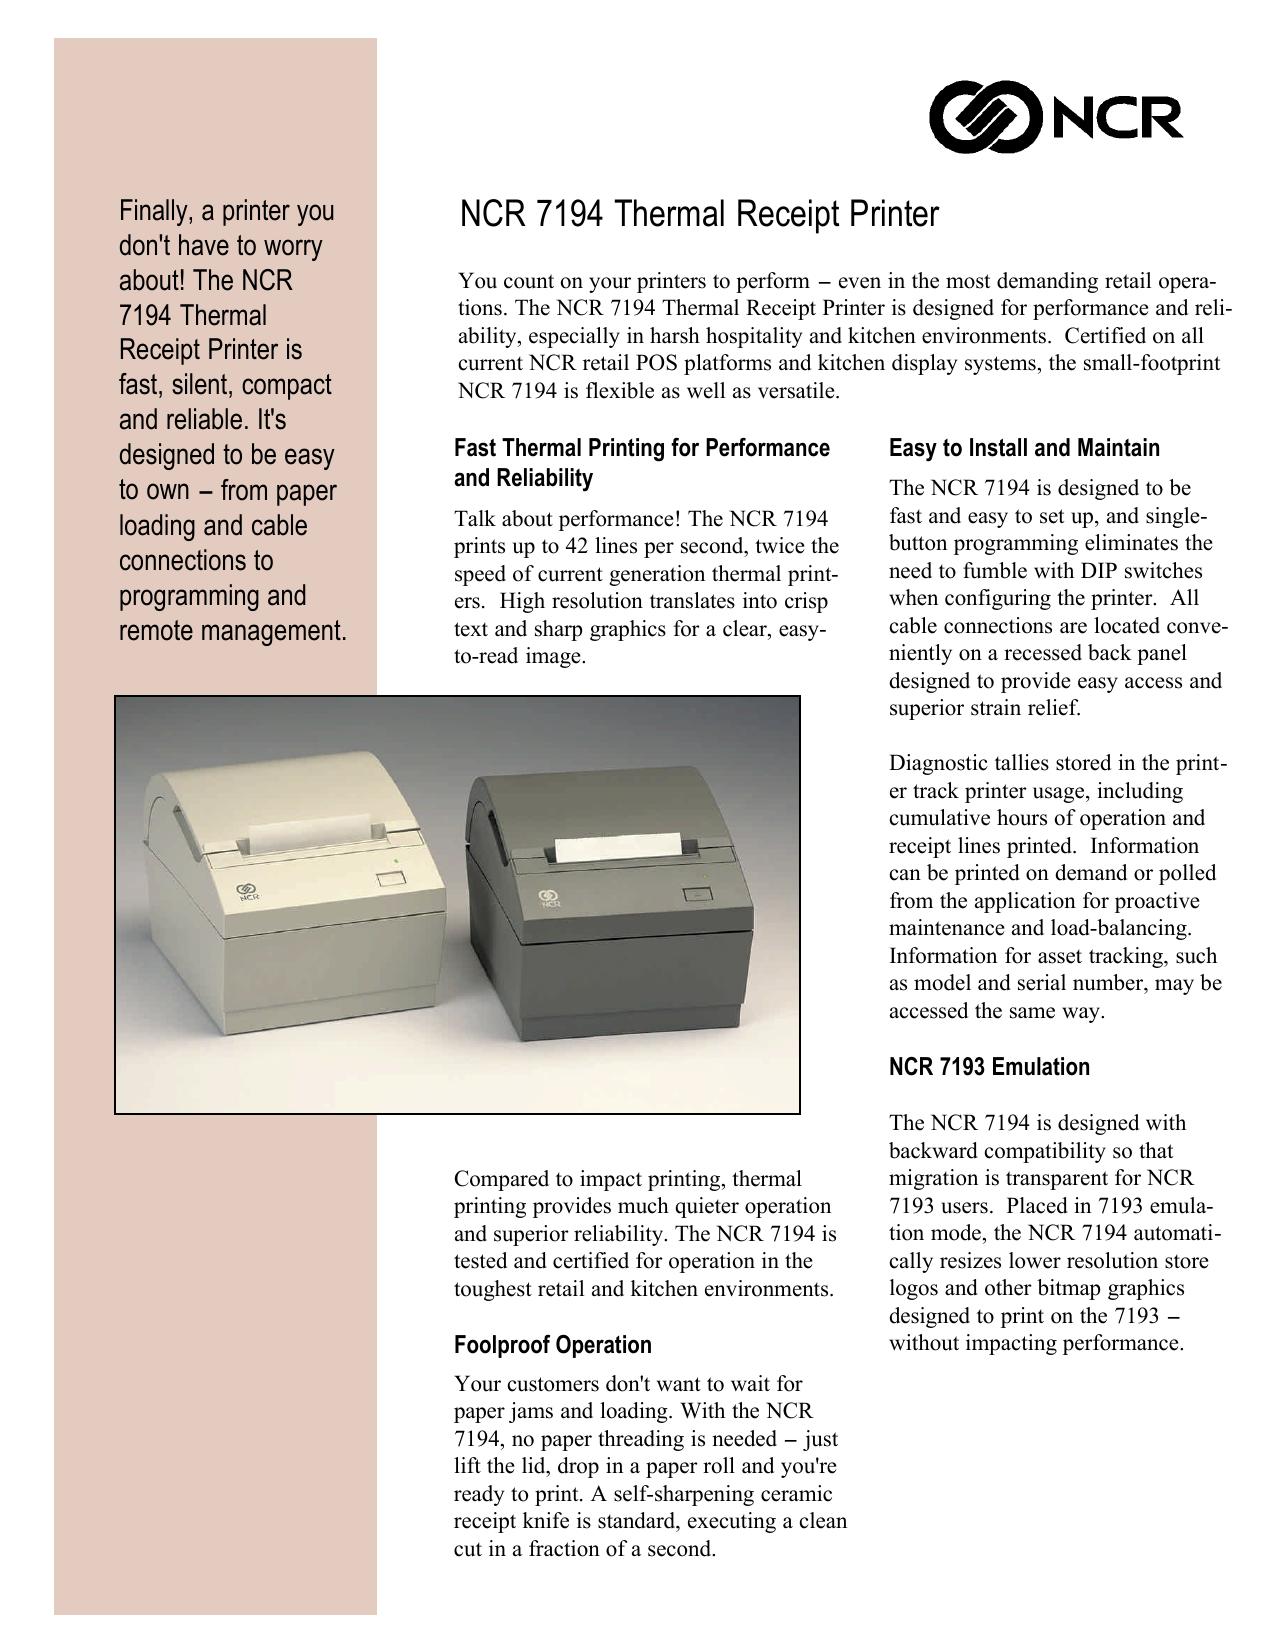 NCR 7194 Thermal Receipt Printer   manualzz com